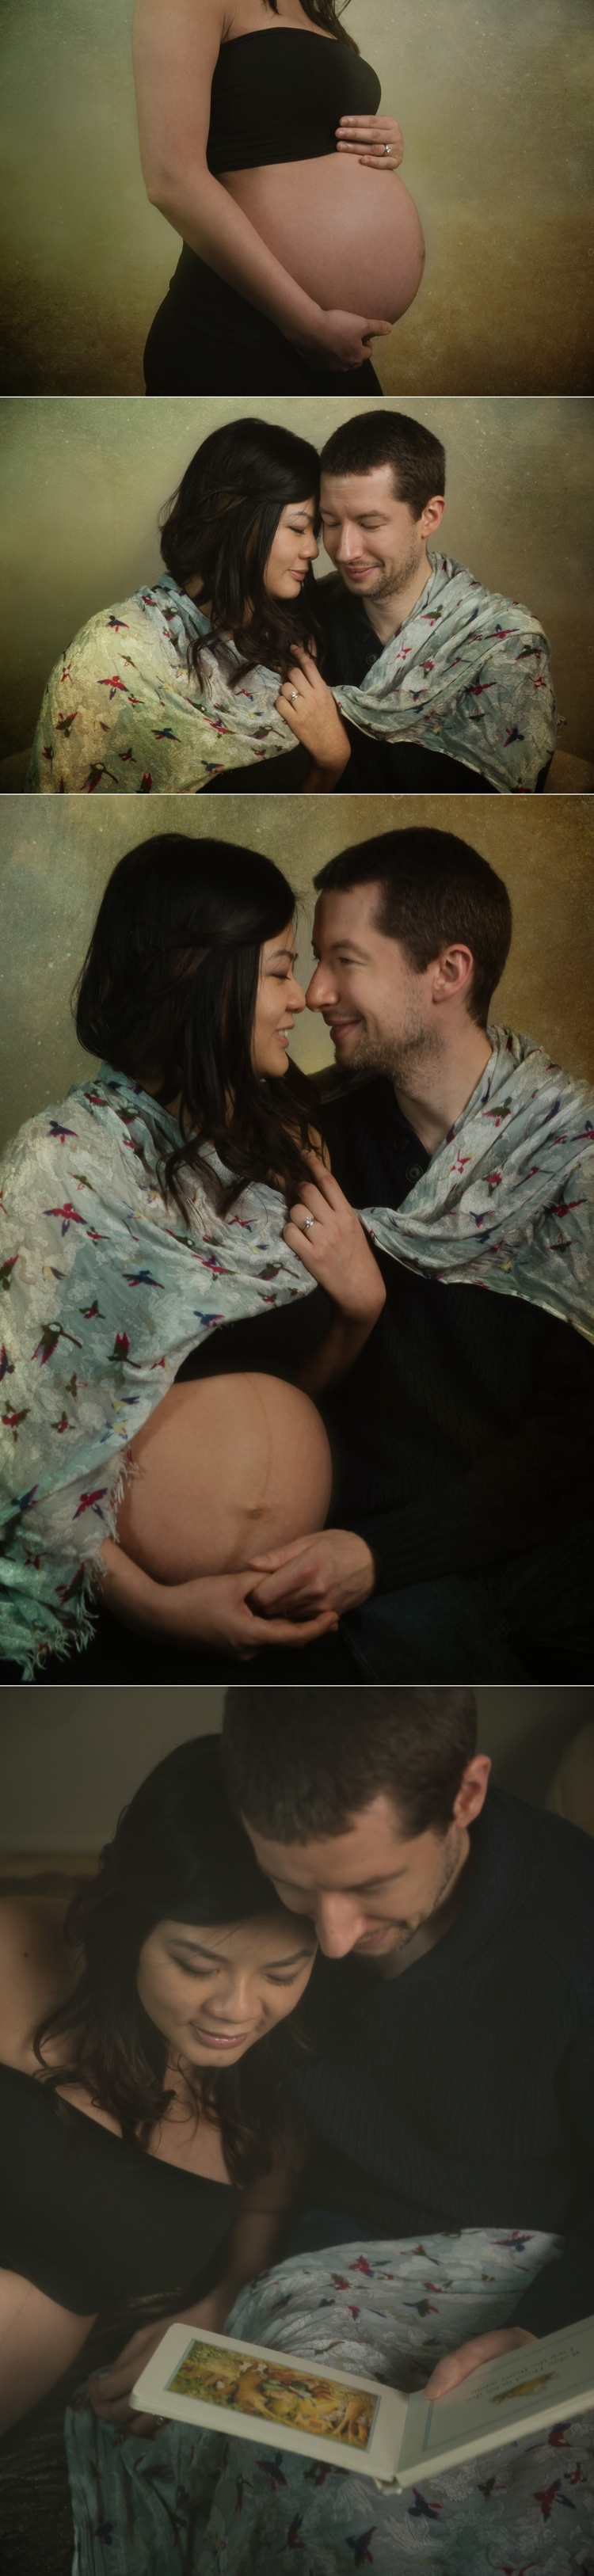 london maternity newborn photographer west ham park lily sawyer photo